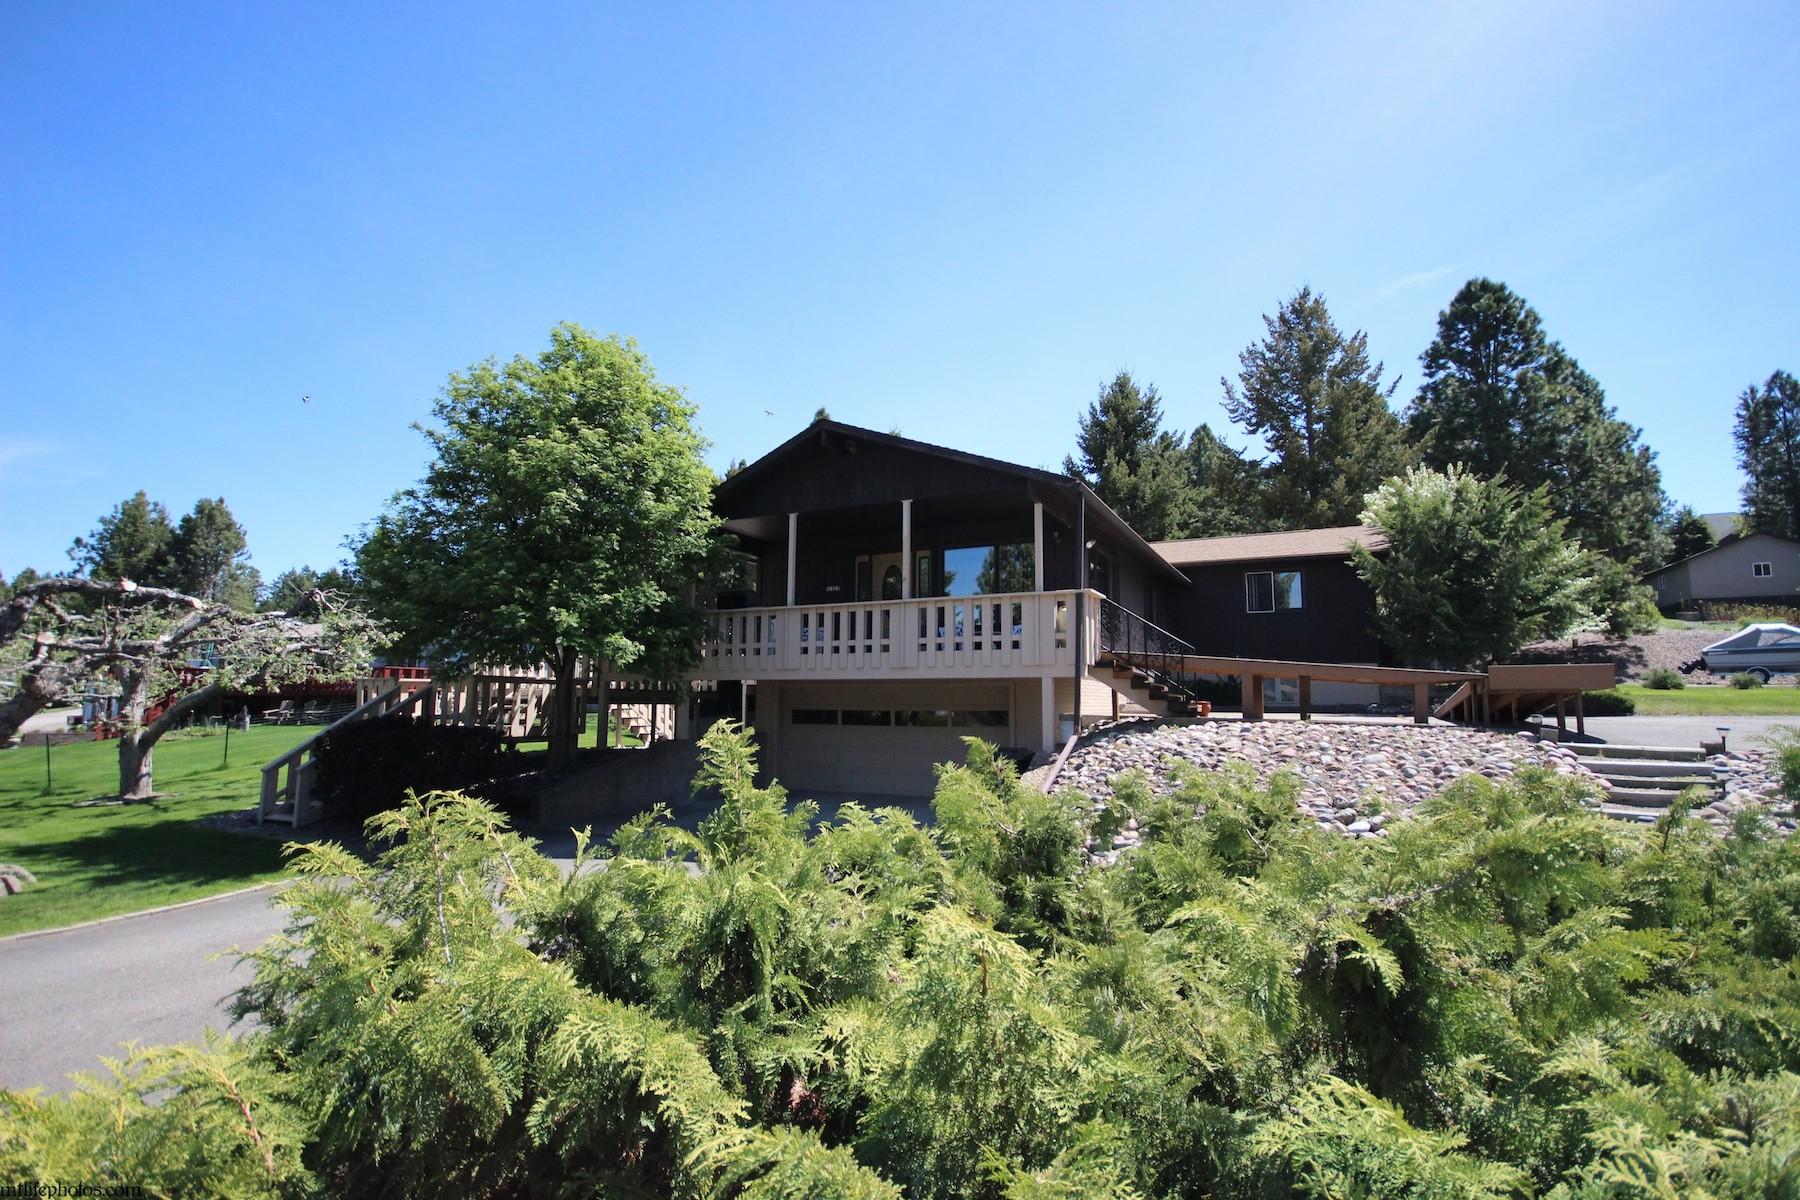 獨棟家庭住宅 為 出售 在 Woods Bay Charmer 15322 Woods Bay Point Road Bigfork, 蒙大拿州, 59911 美國